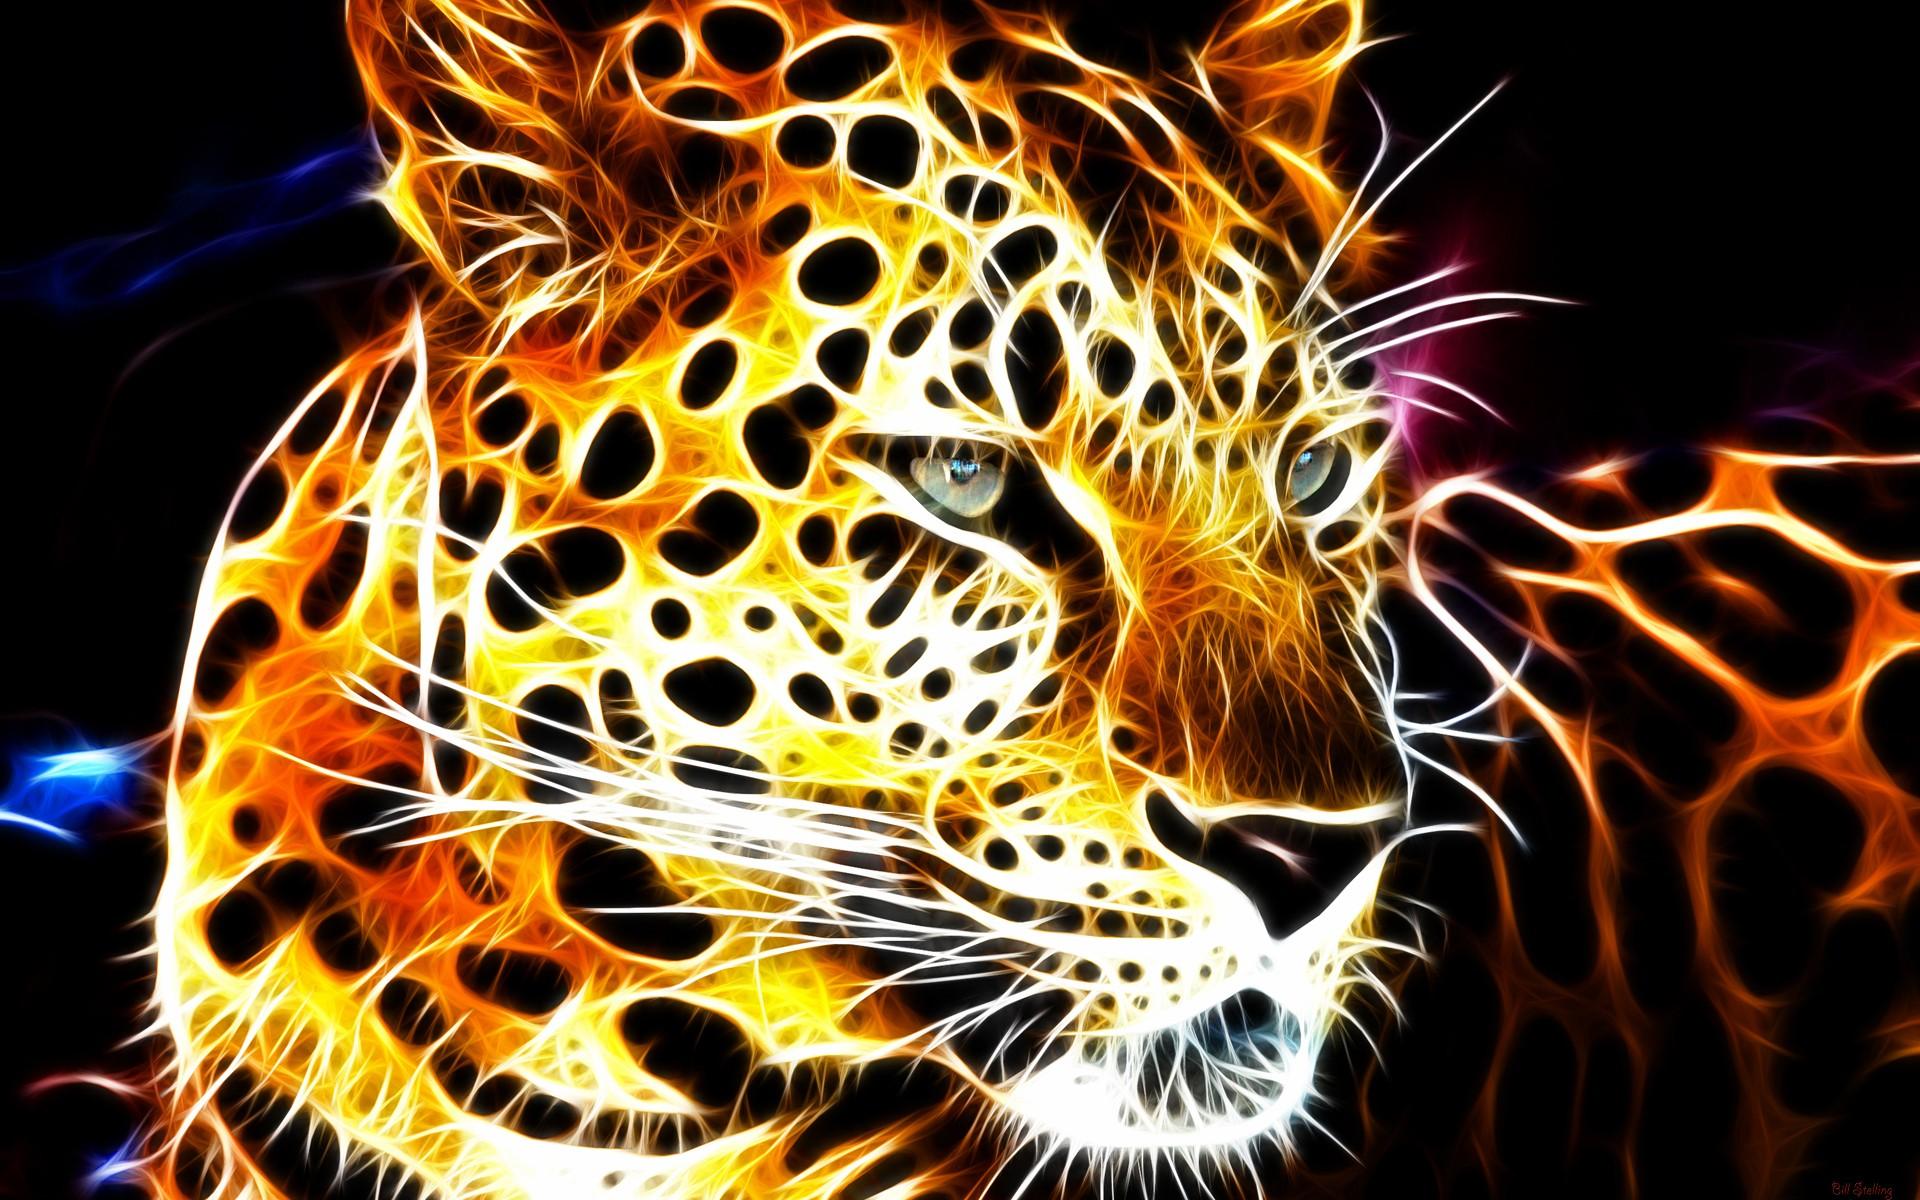 animals fractals fractalius shining glowing leopards black